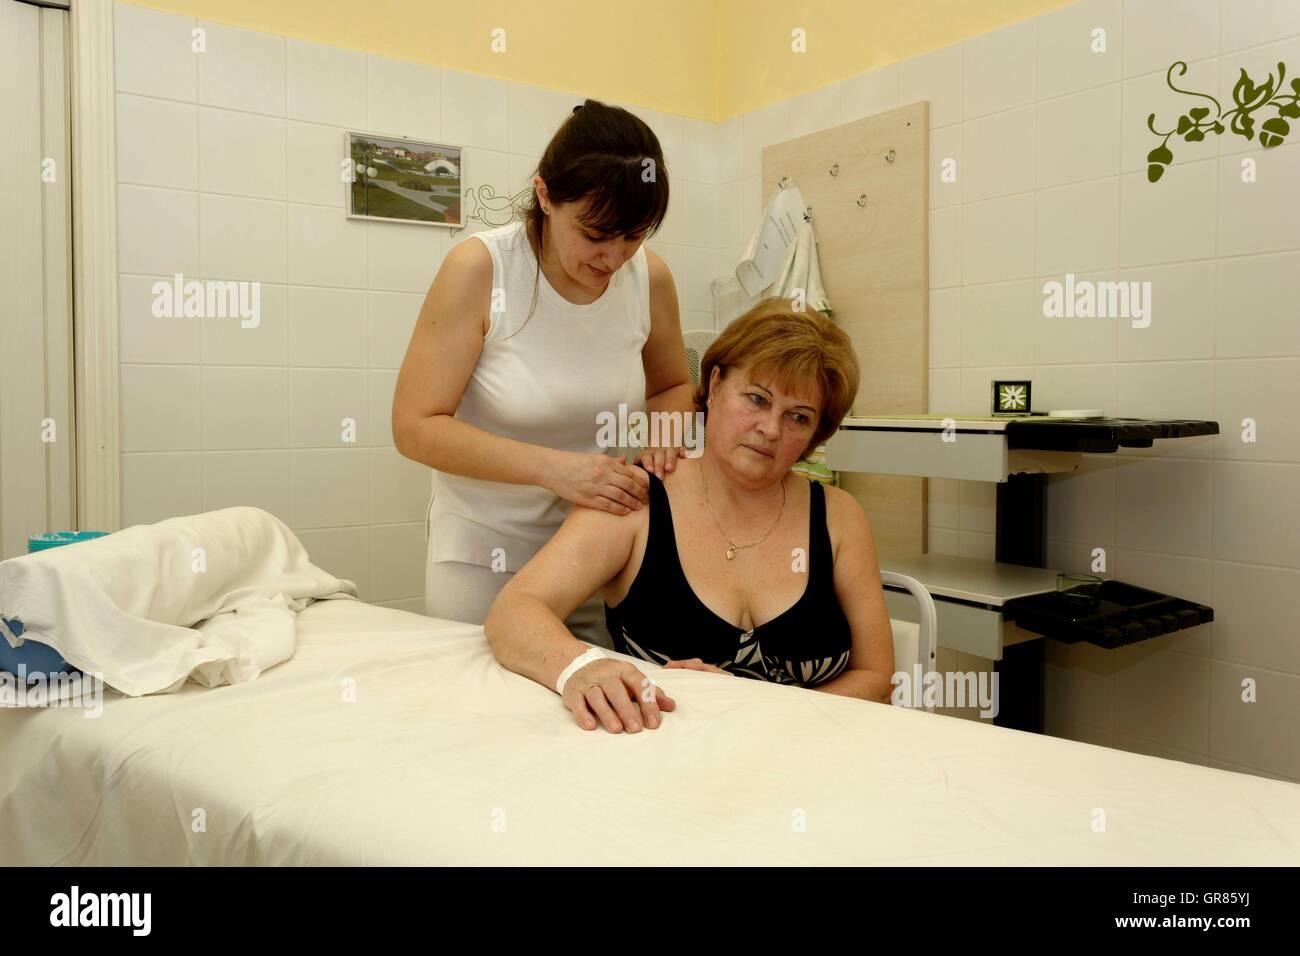 Shoulder Massage At The Spa Masseuse By Senior Cegled - Stock Image